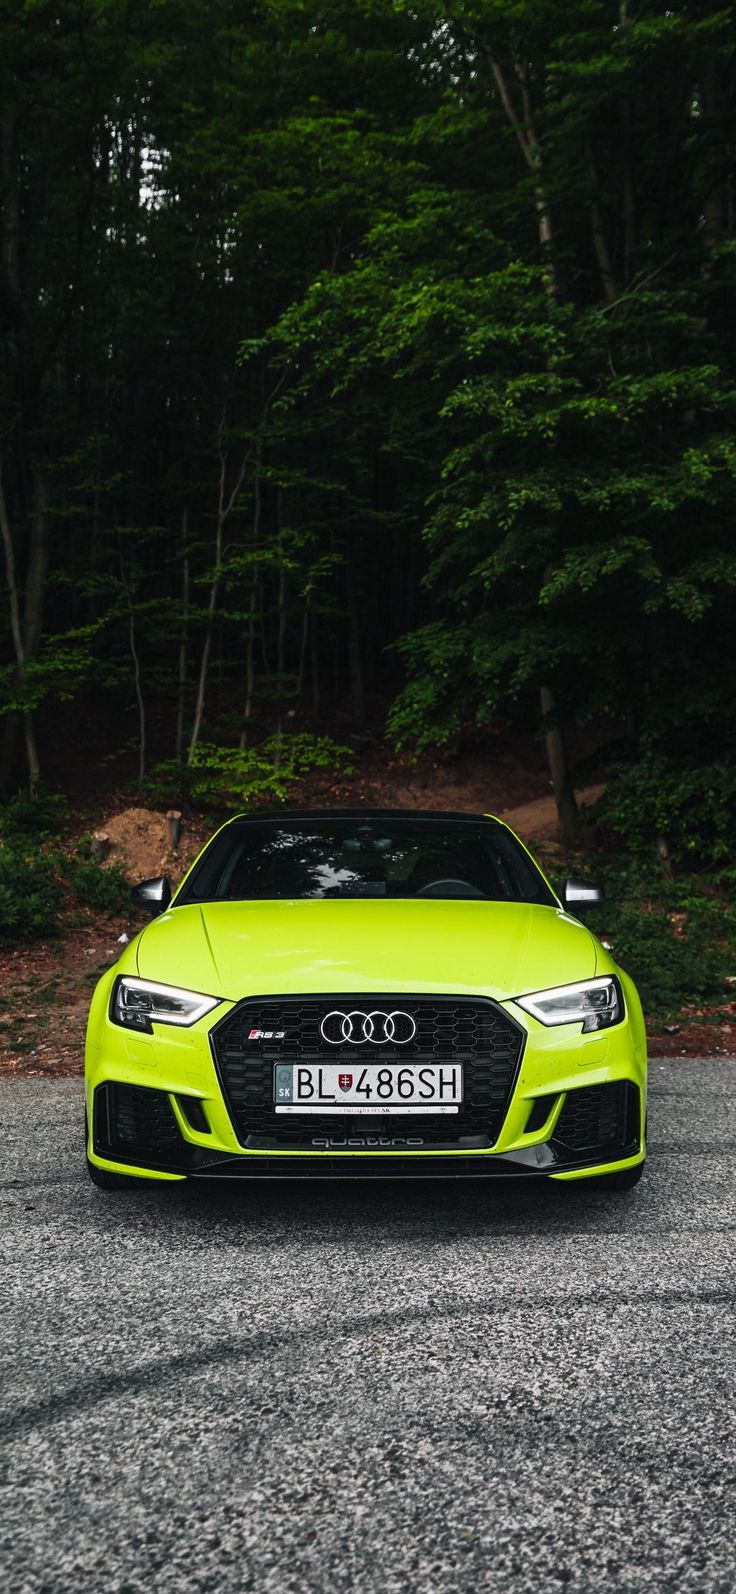 Pin By Patrycja Rataj On Vehicle Car Iphone Wallpaper Audi Audi Rs4